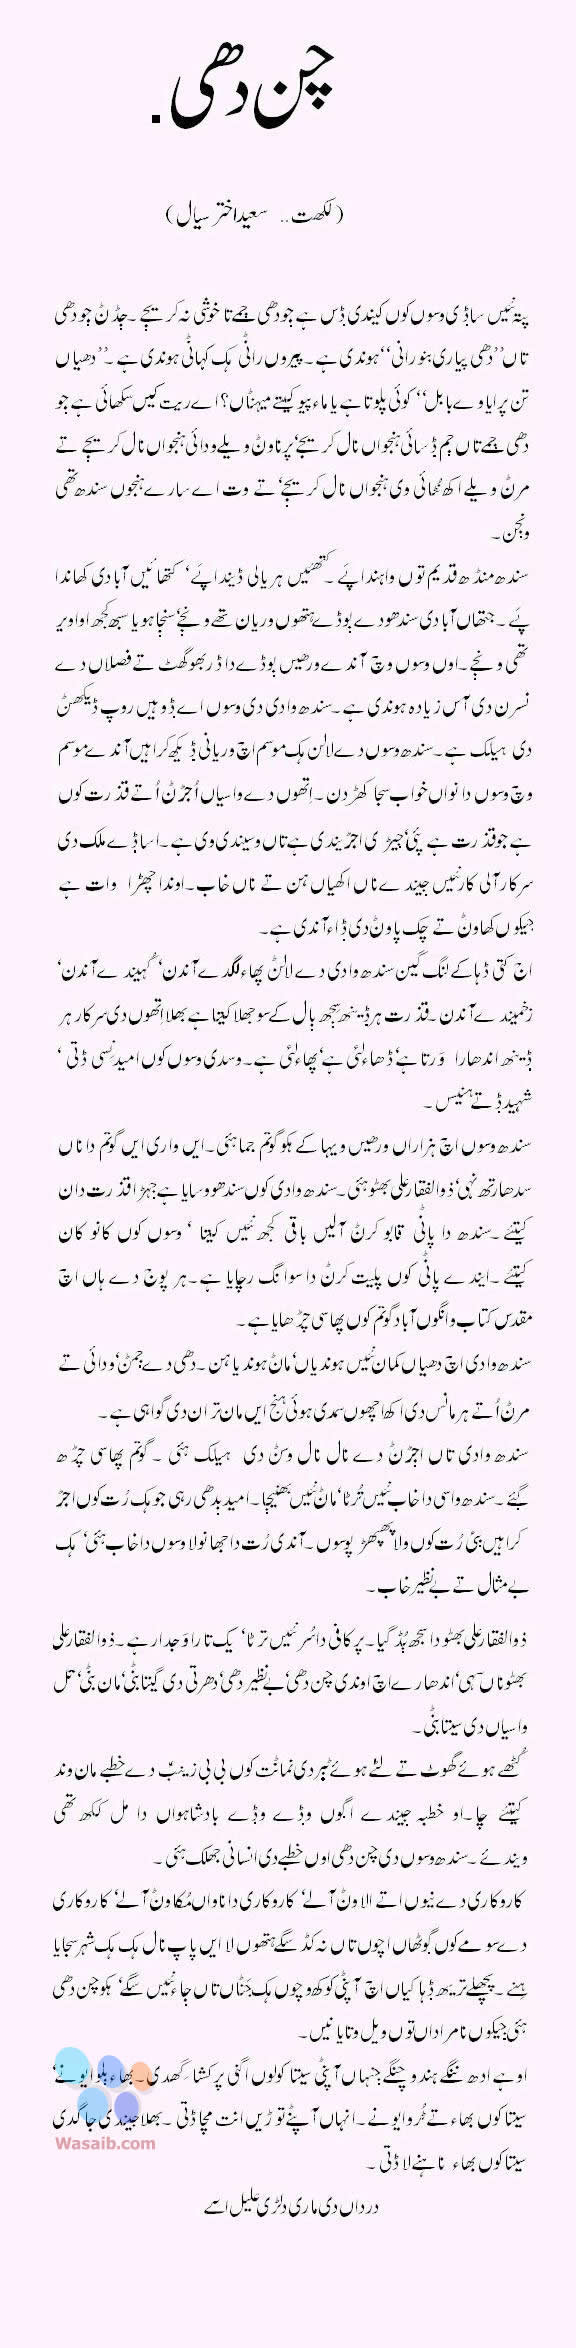 Ajj Di Gaalh - Chan Dhi (Benazir Bhutto)